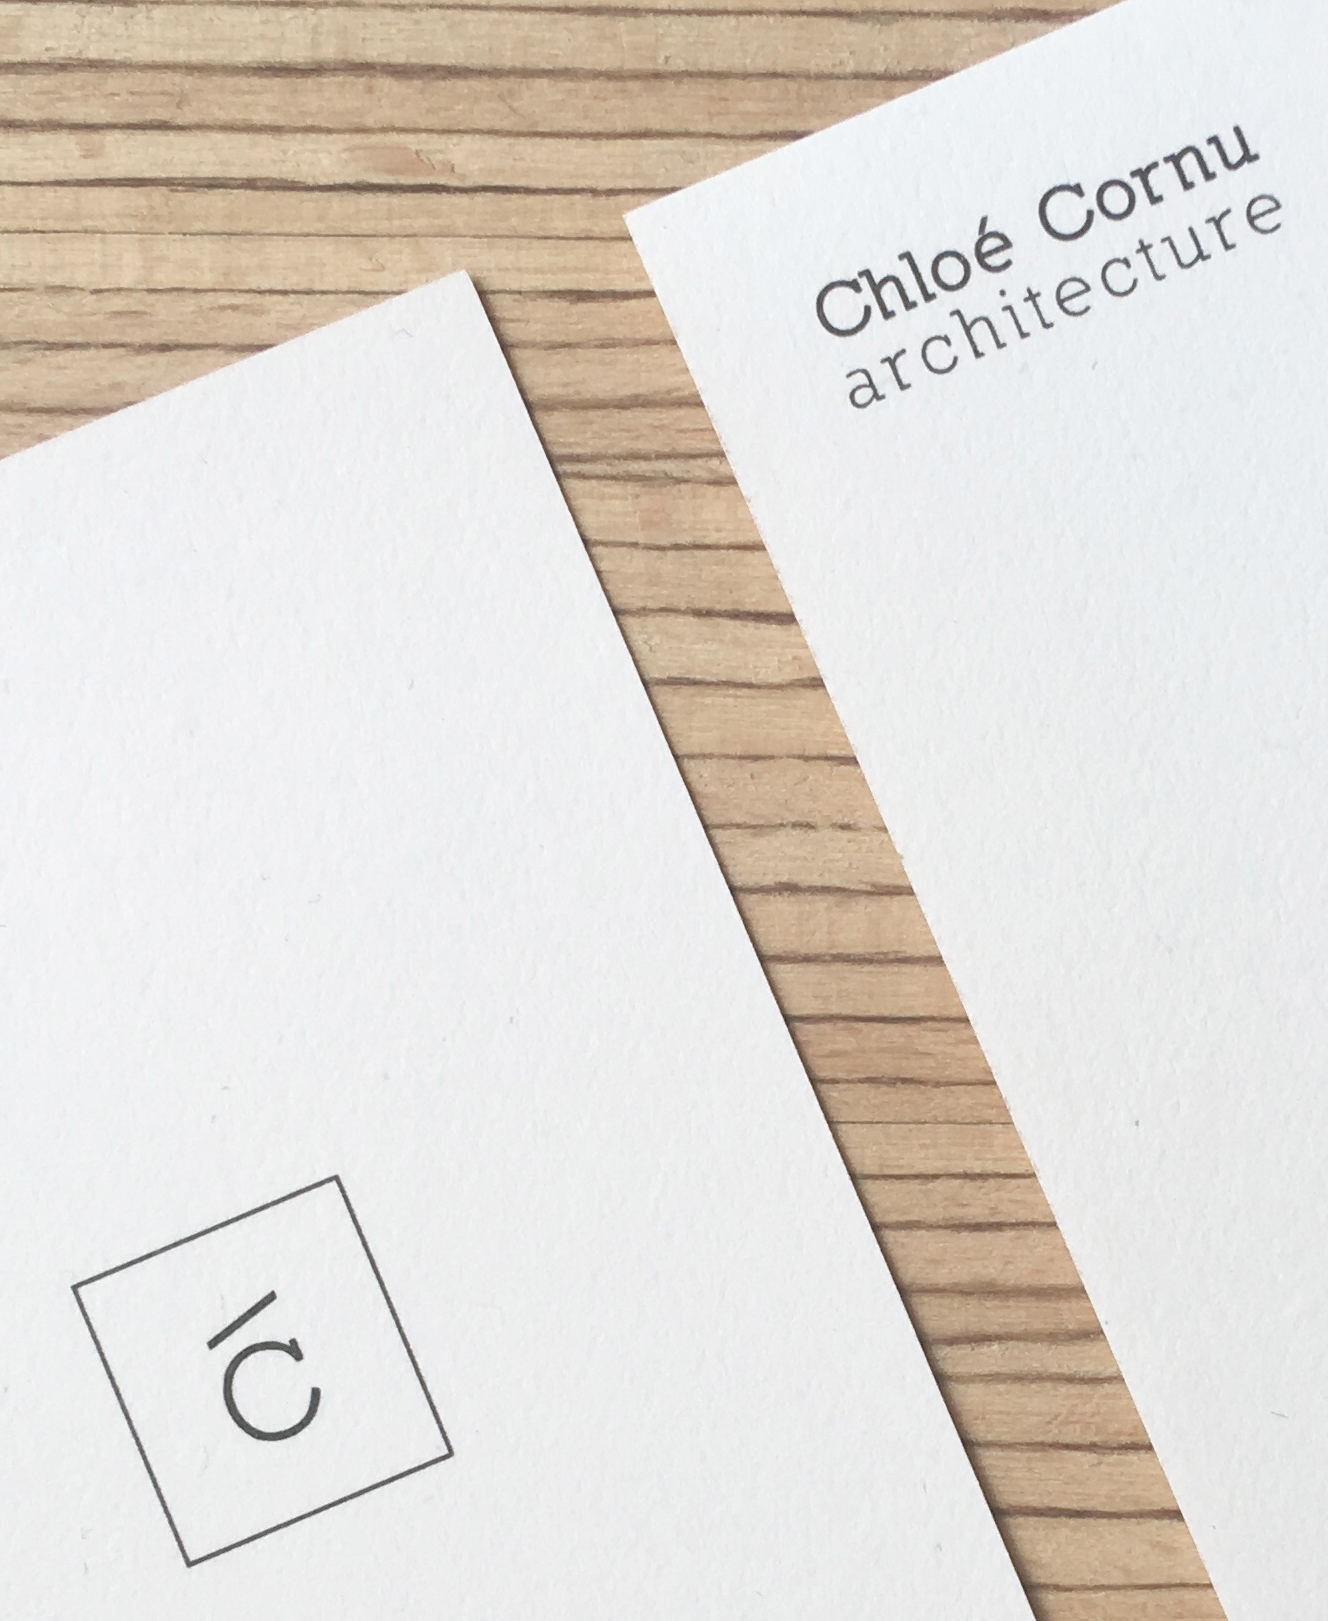 Chloé Cornu Architecte - Contact 3.jpg